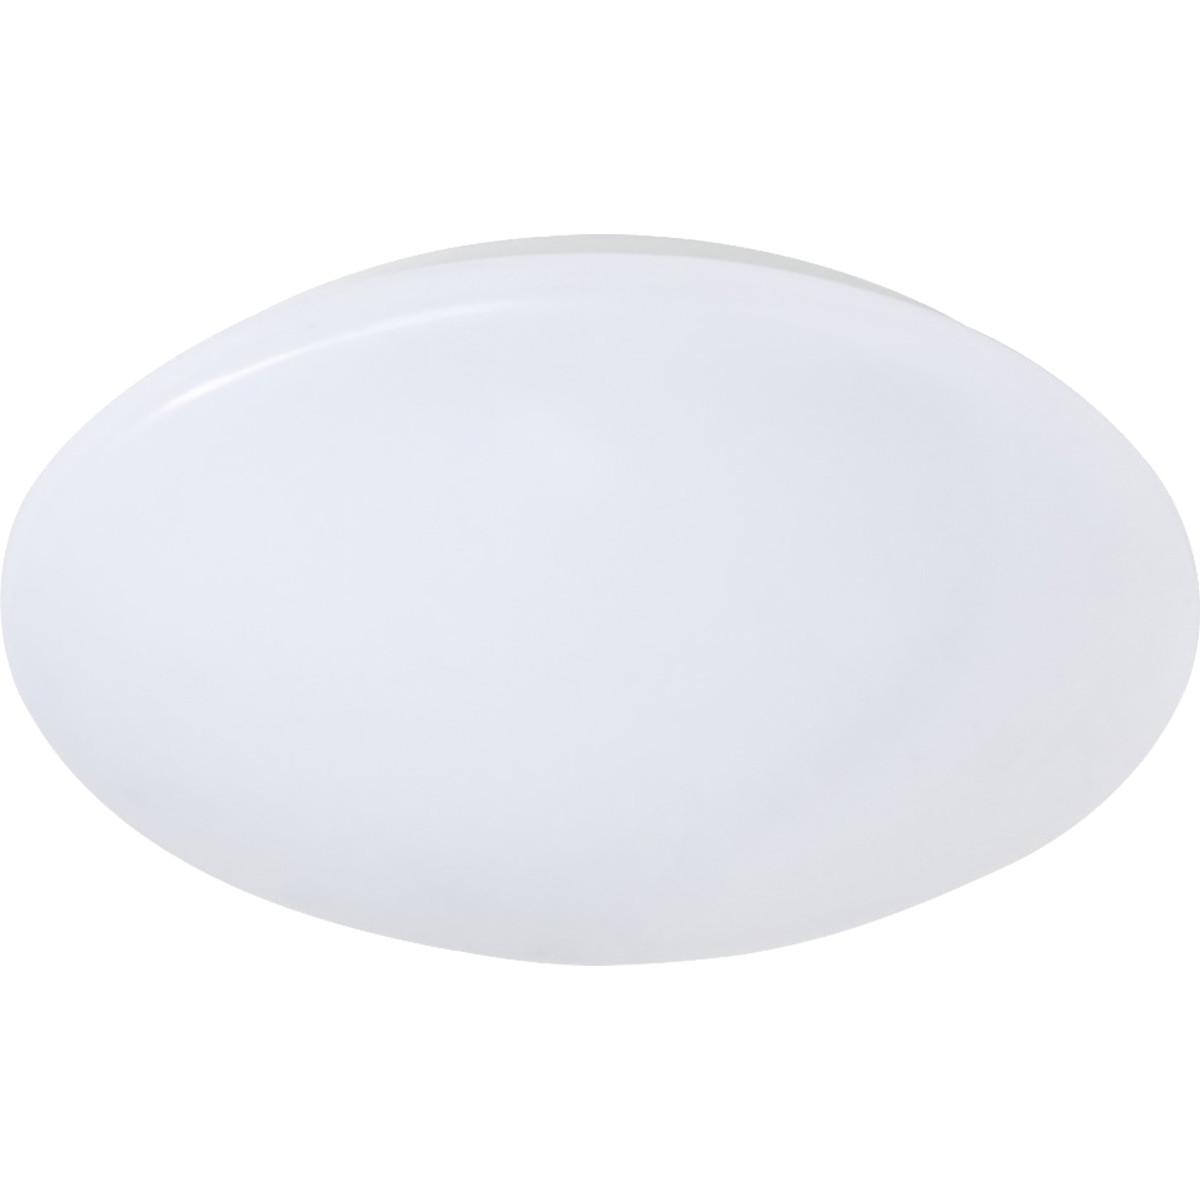 LED Plafondlamp - Trion Puta - Opbouw Rond 12W - Spatwaterdicht IP44 - Warm Wit 3000K - Mat Wit Kuns